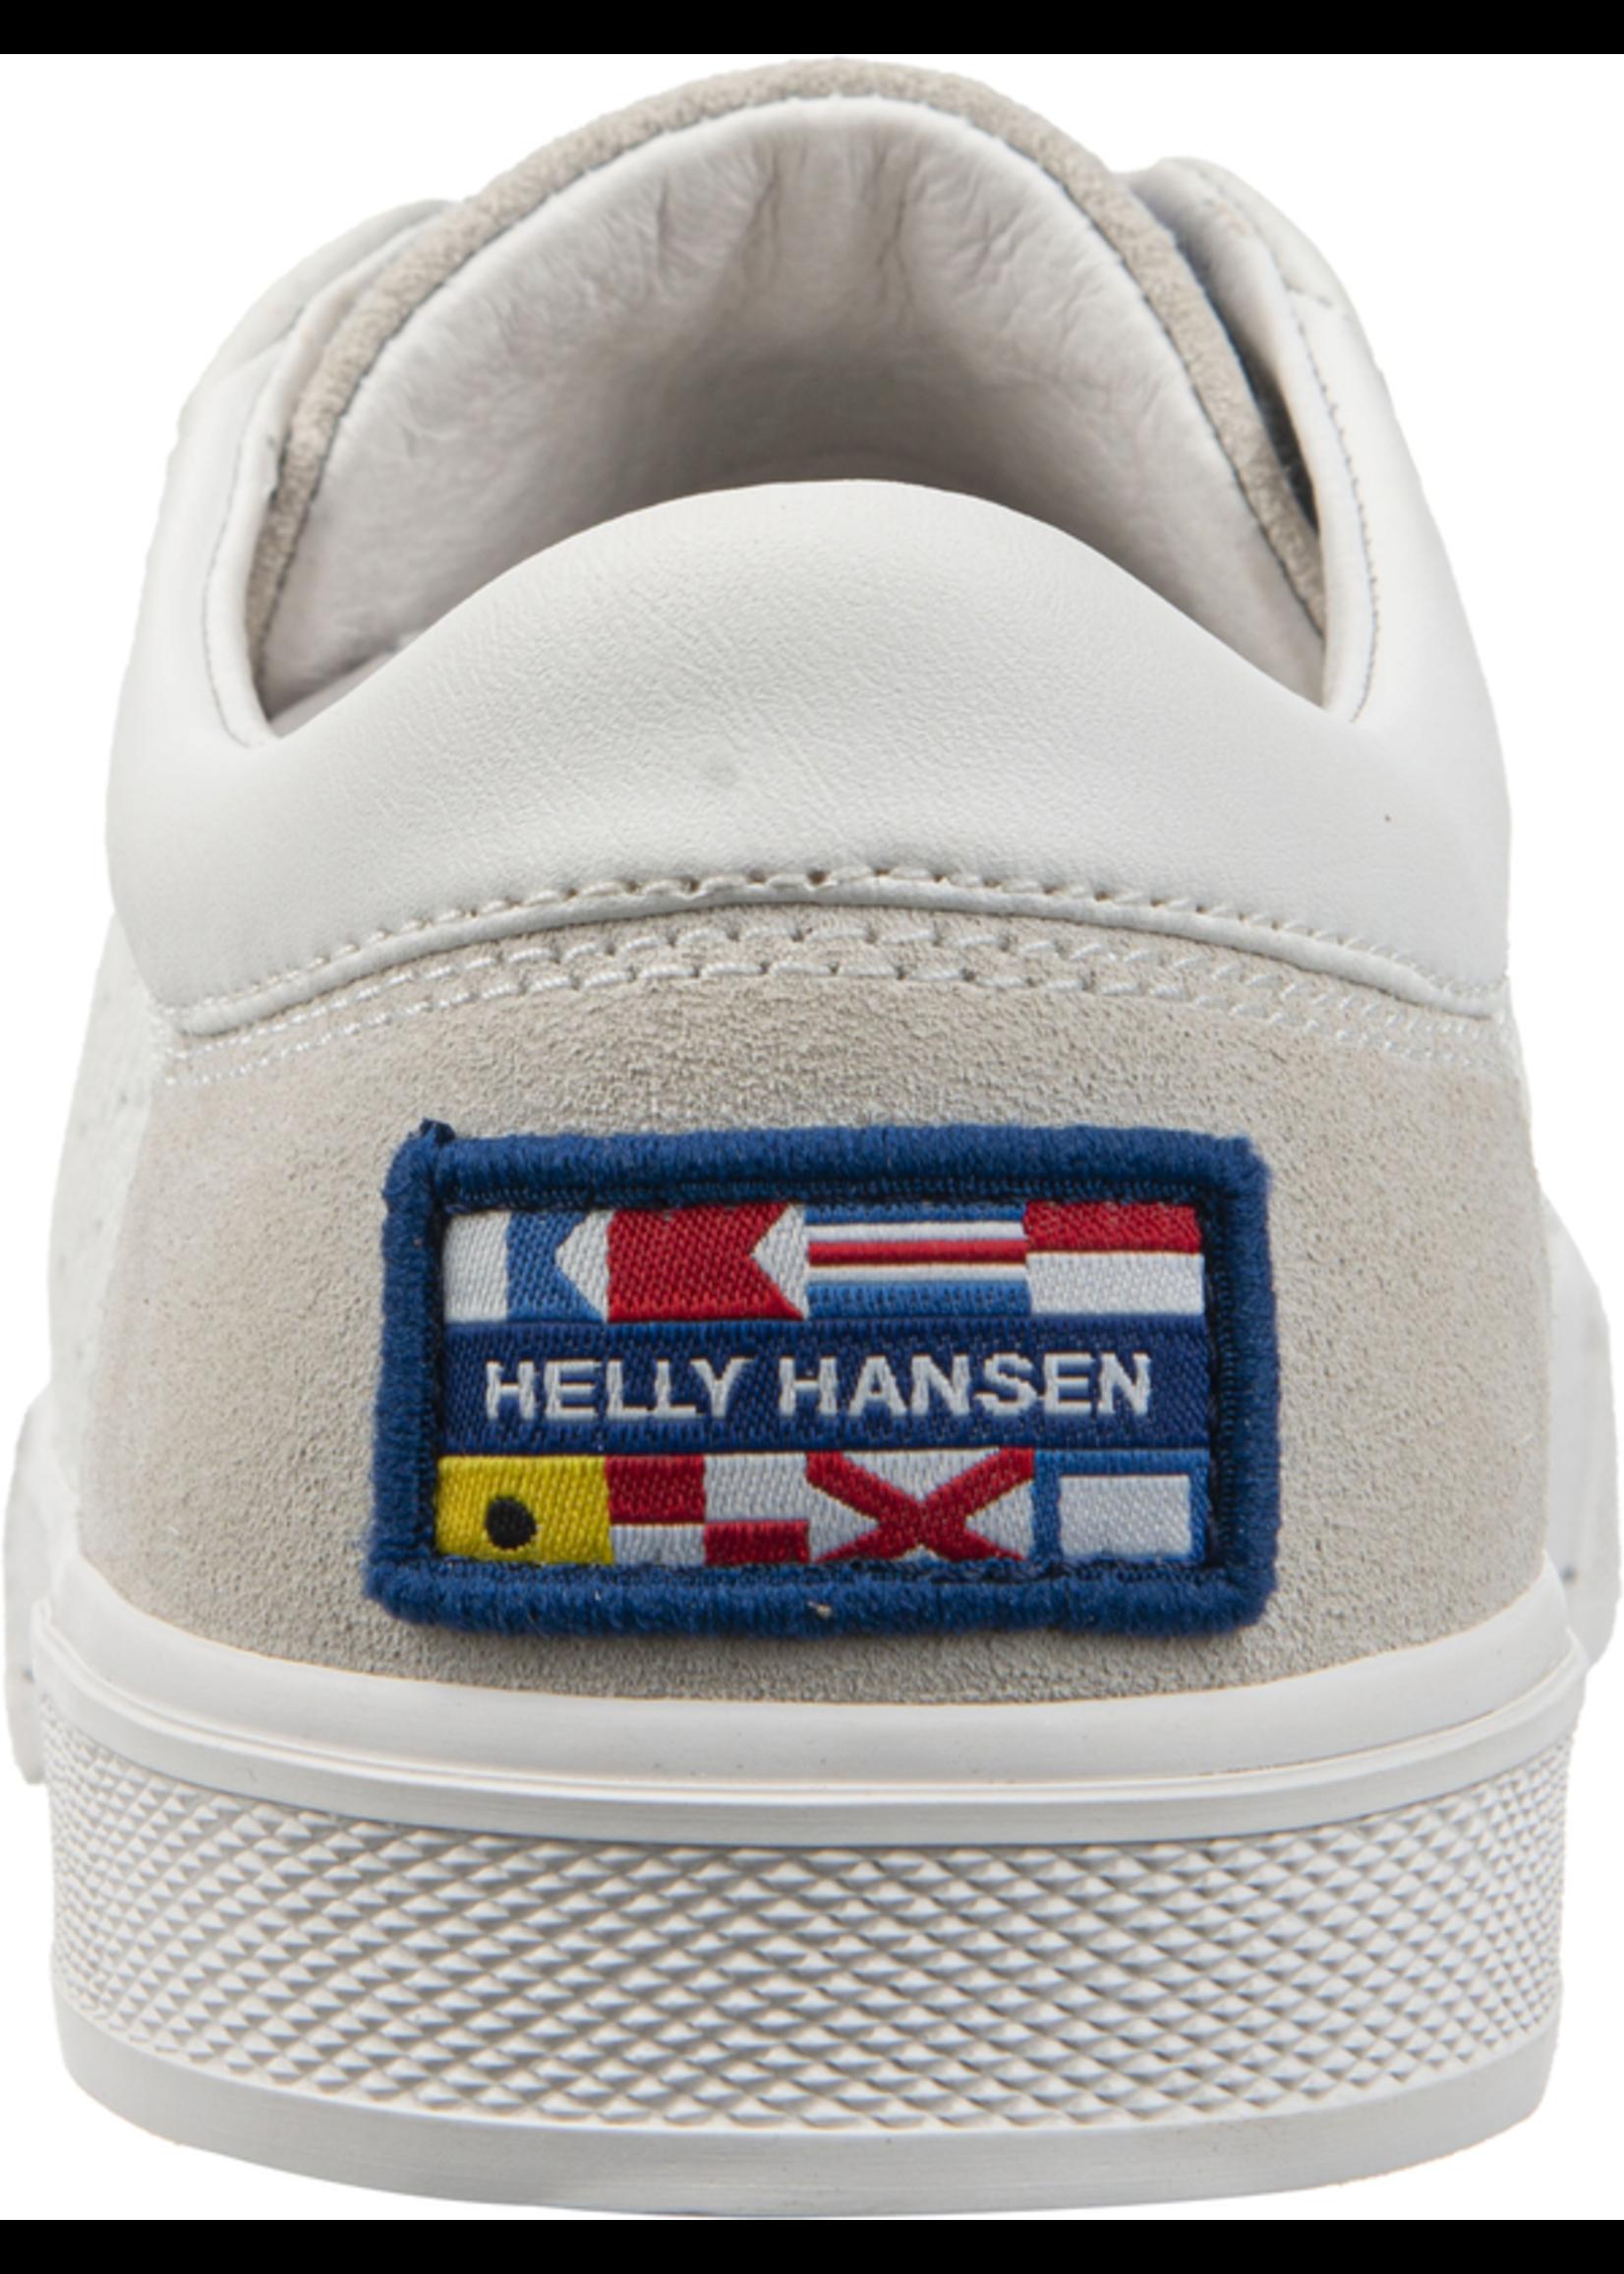 HELLY HANSEN Souliers Copenhagen